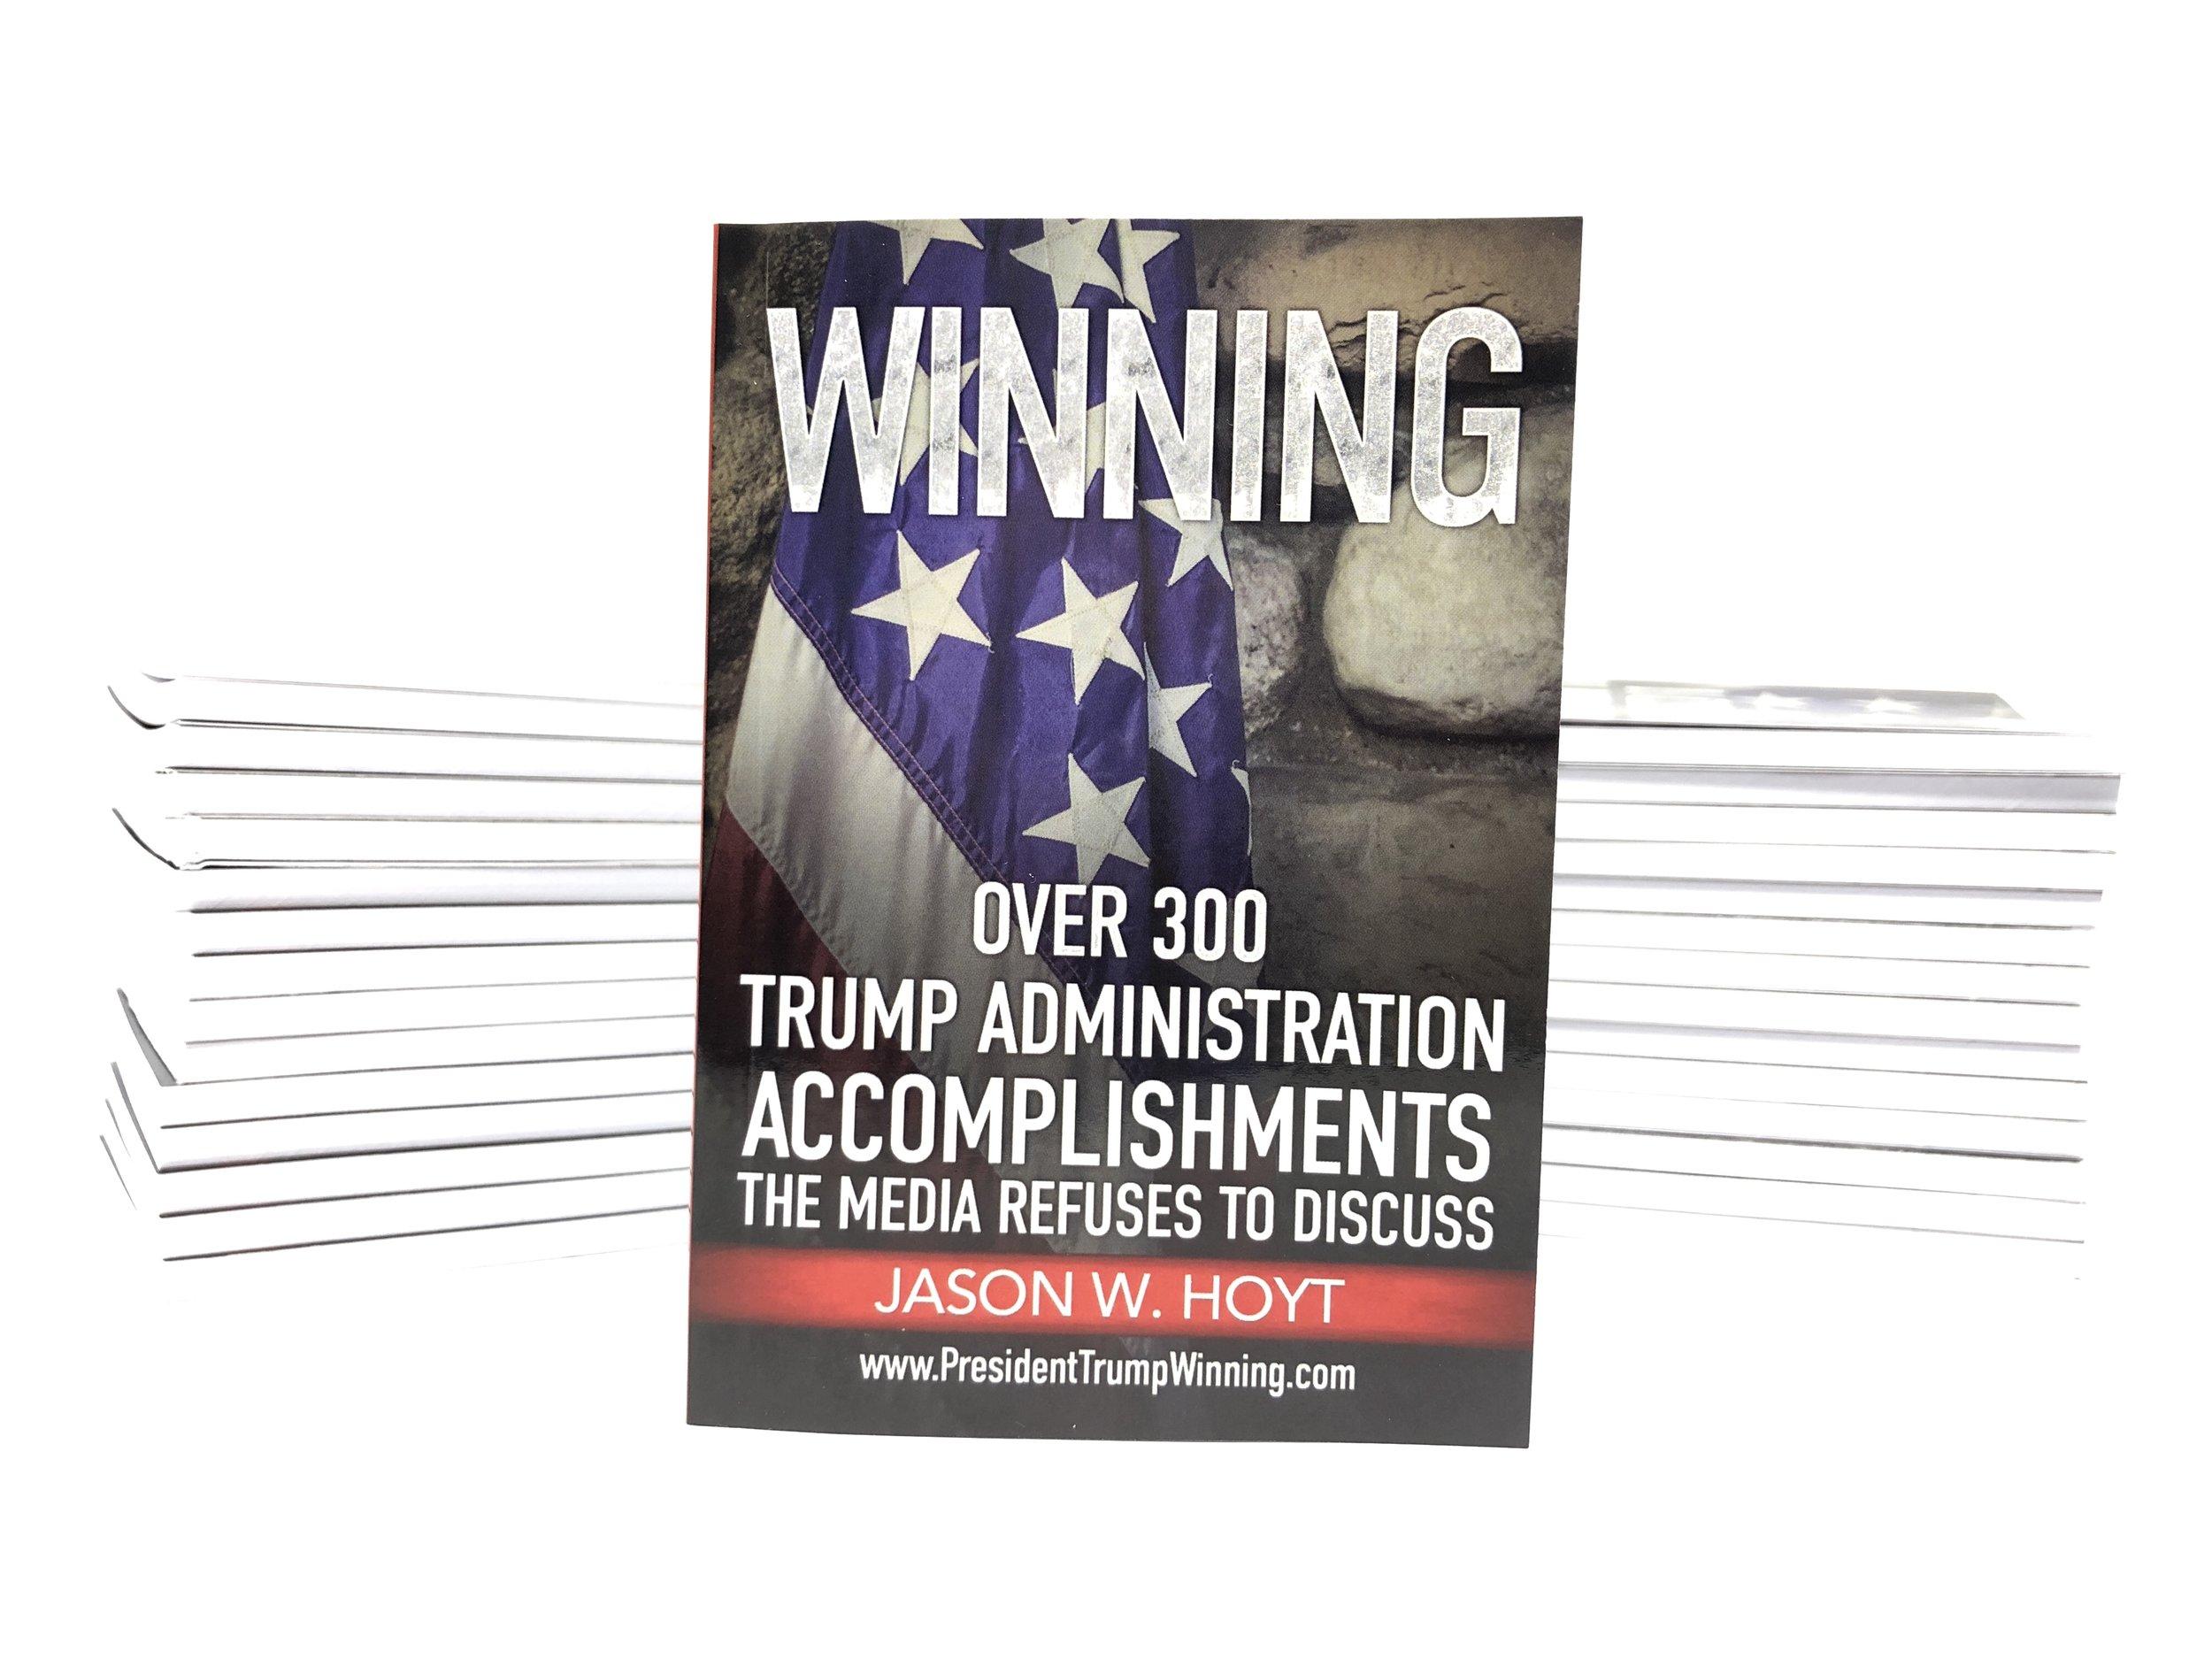 WINNING - 1 Book Stack - Trump Administration List of Accomplishments Jason W Hoyt.JPG